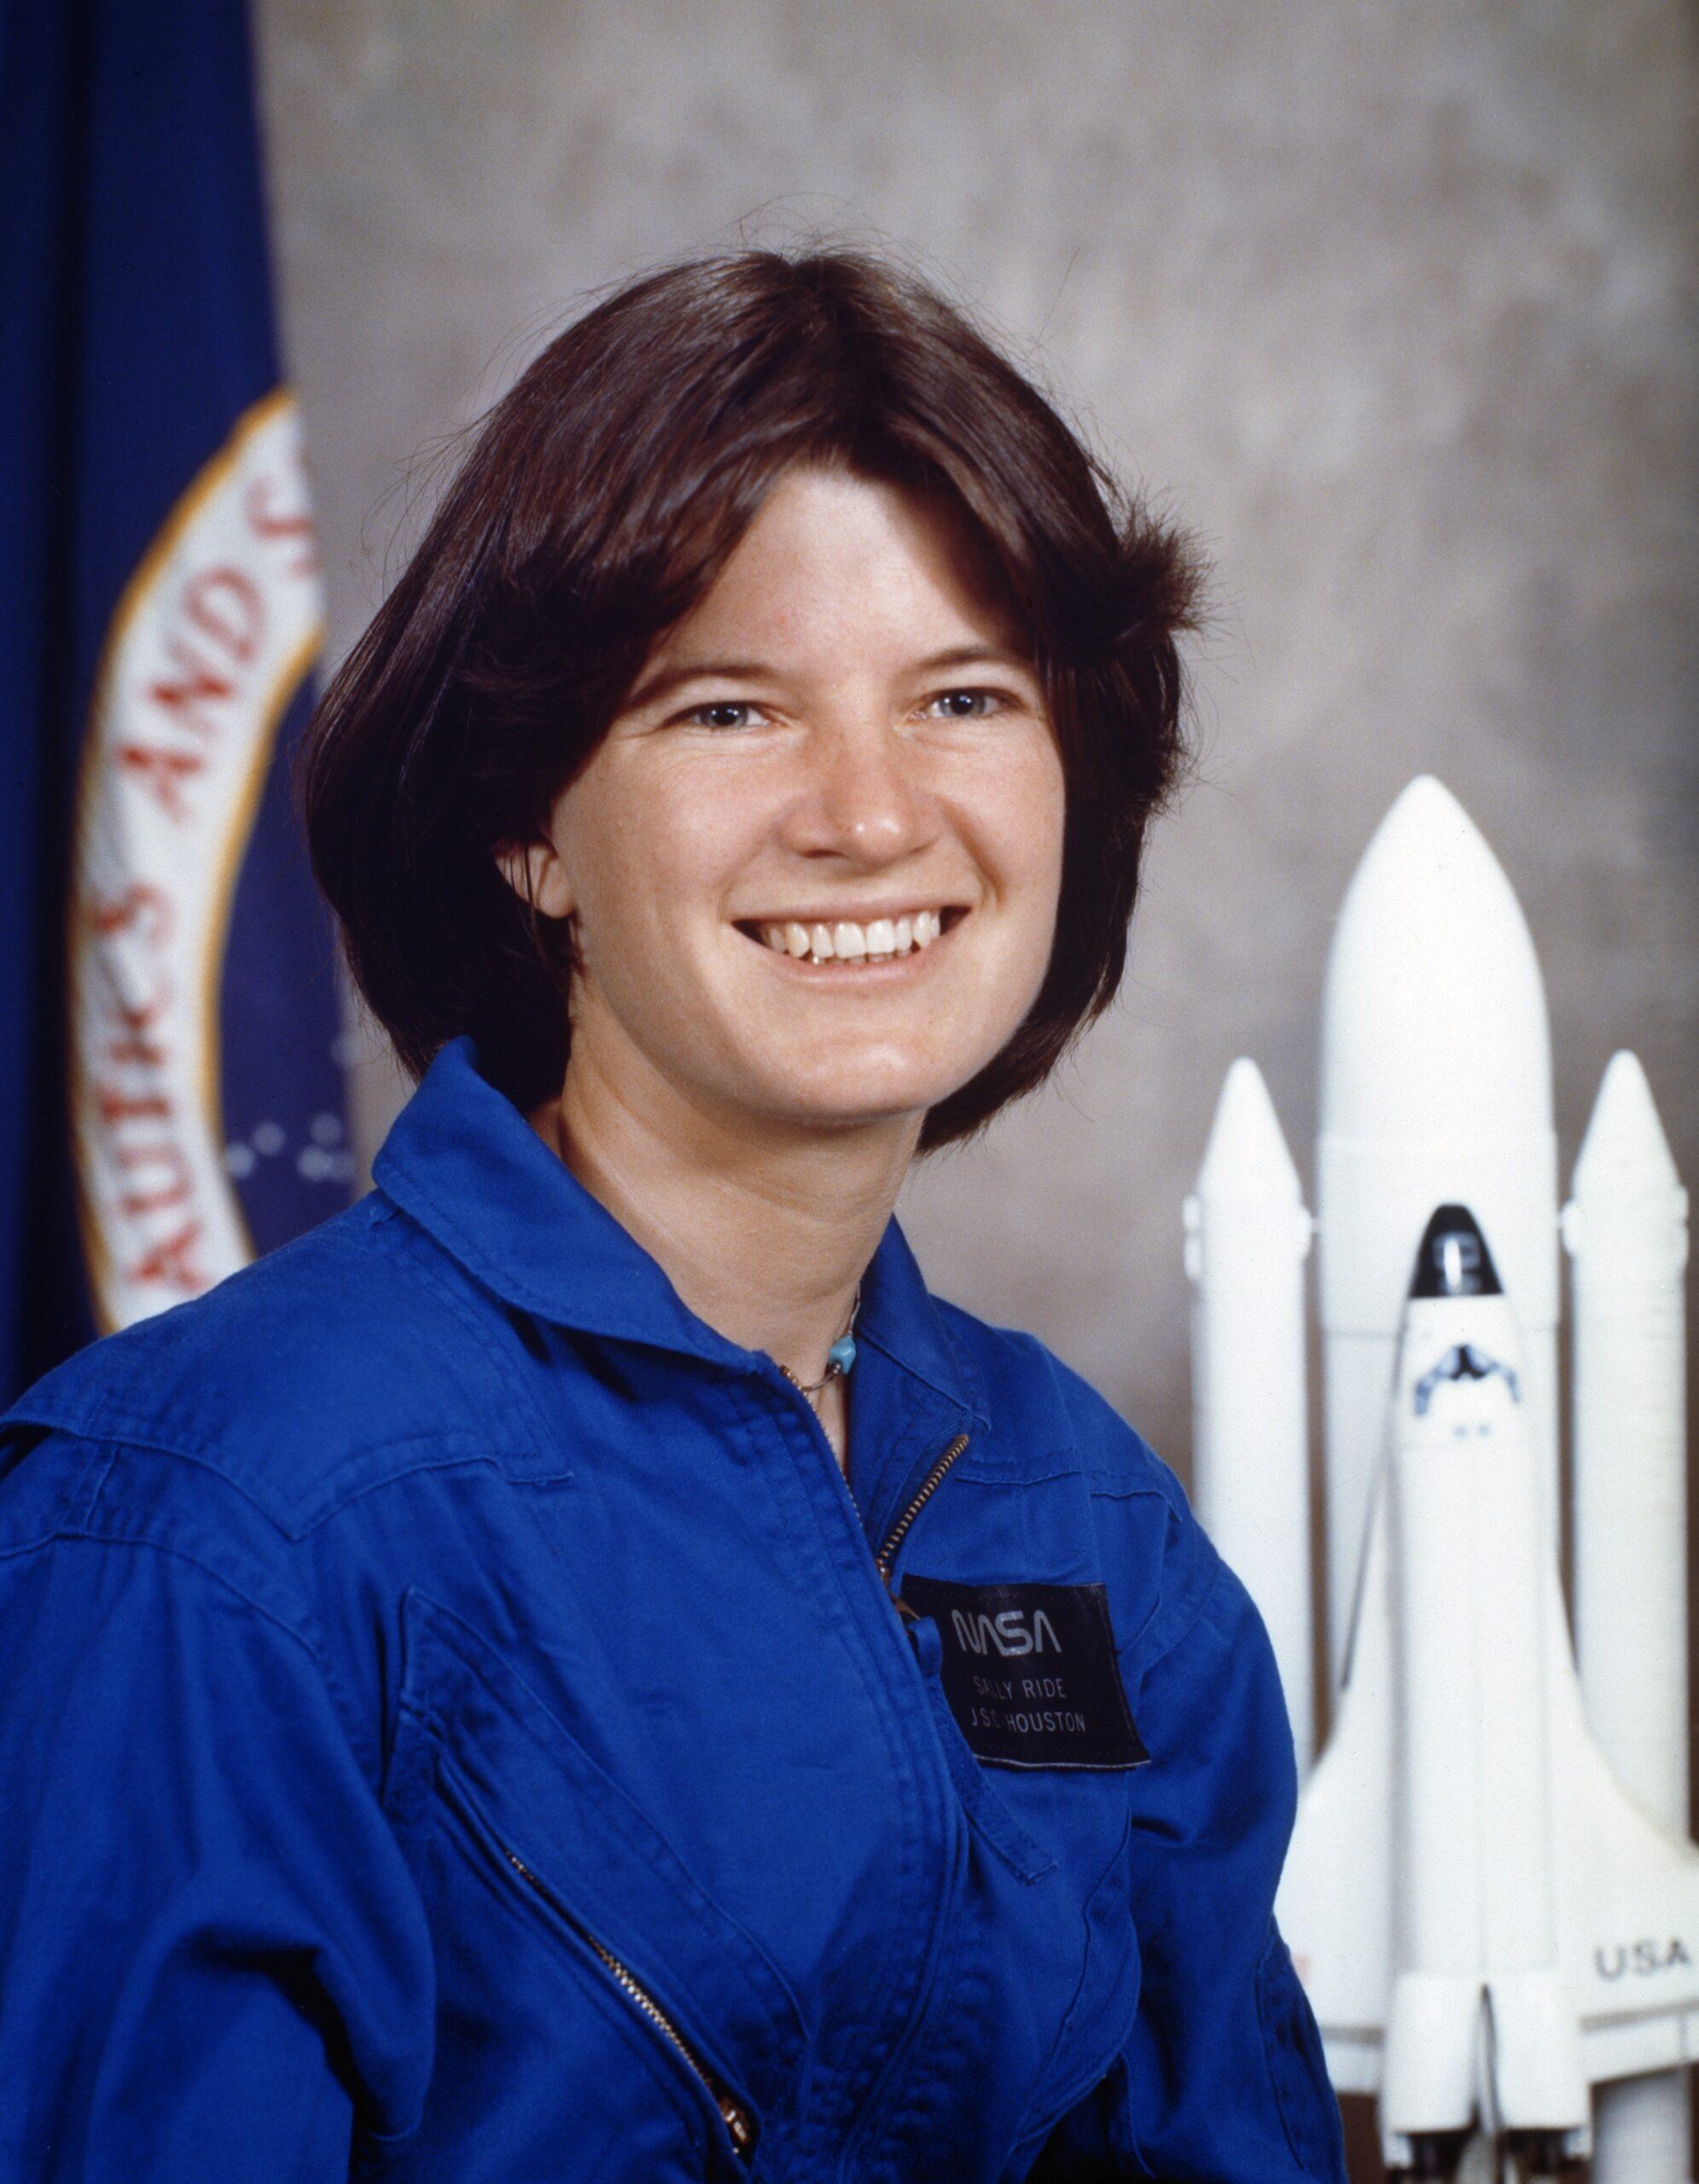 Sally Ride 1979 NASA Portrait